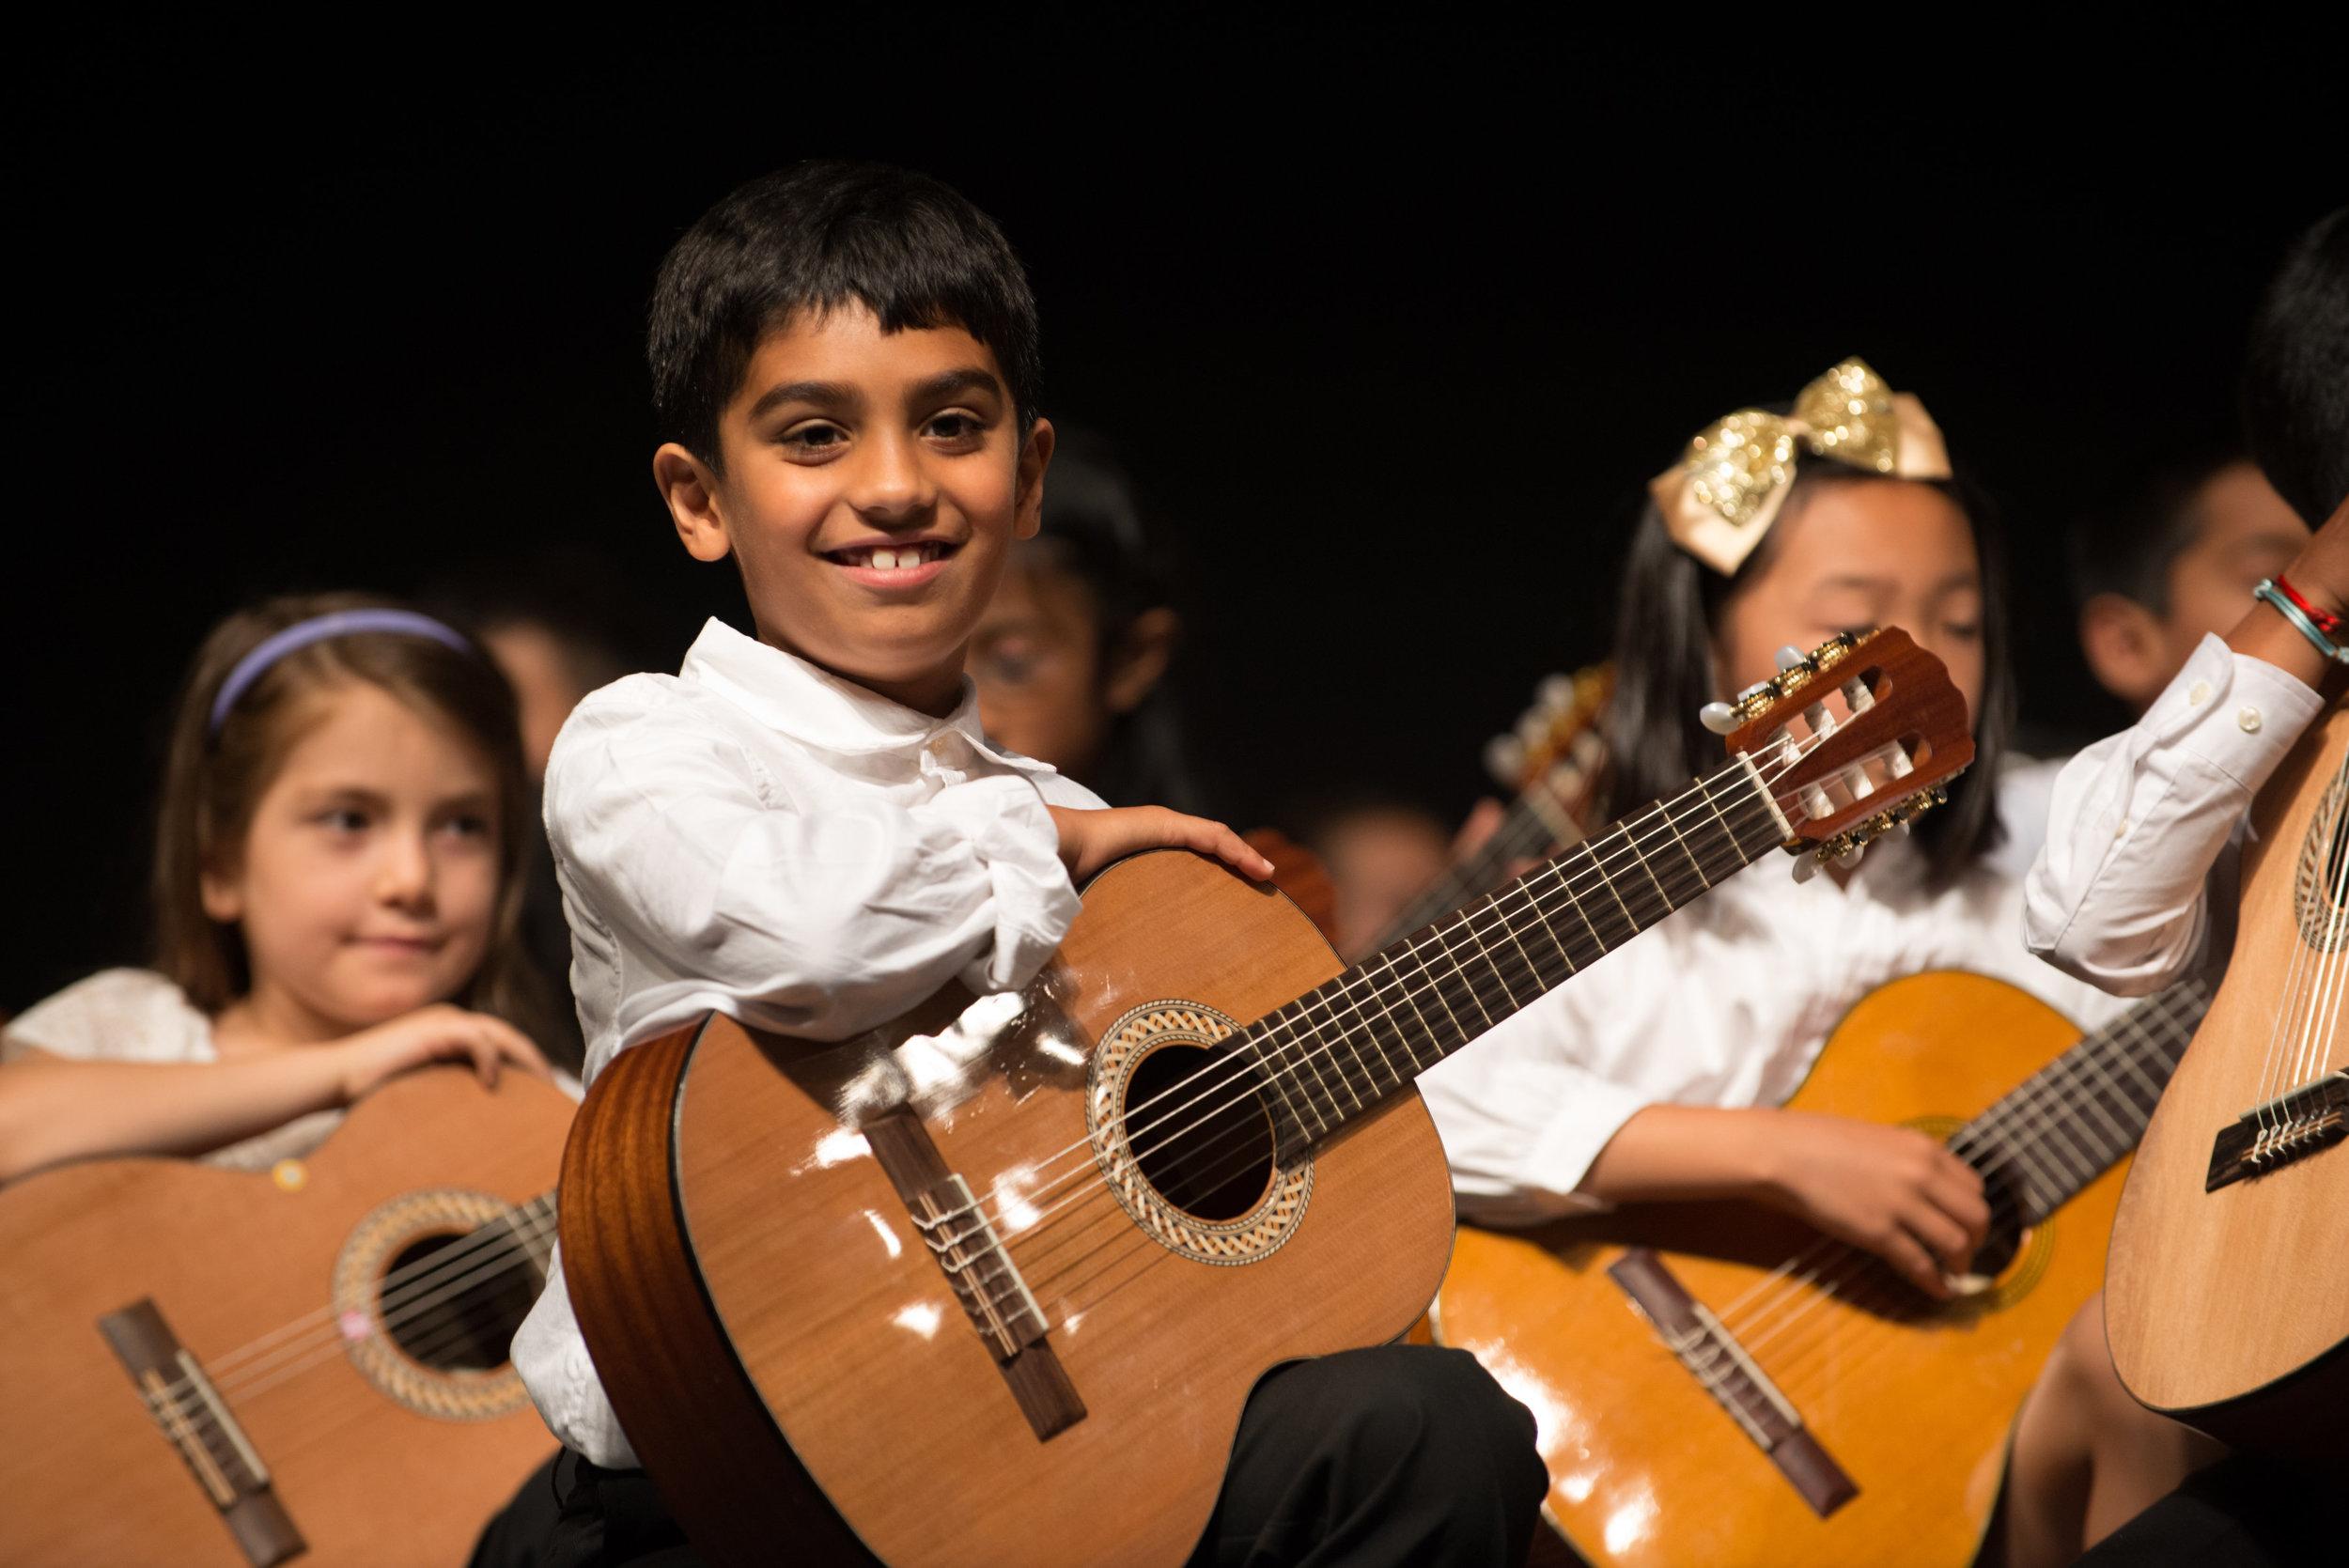 Copy of Guitar Concert Santa Clara Convention Center